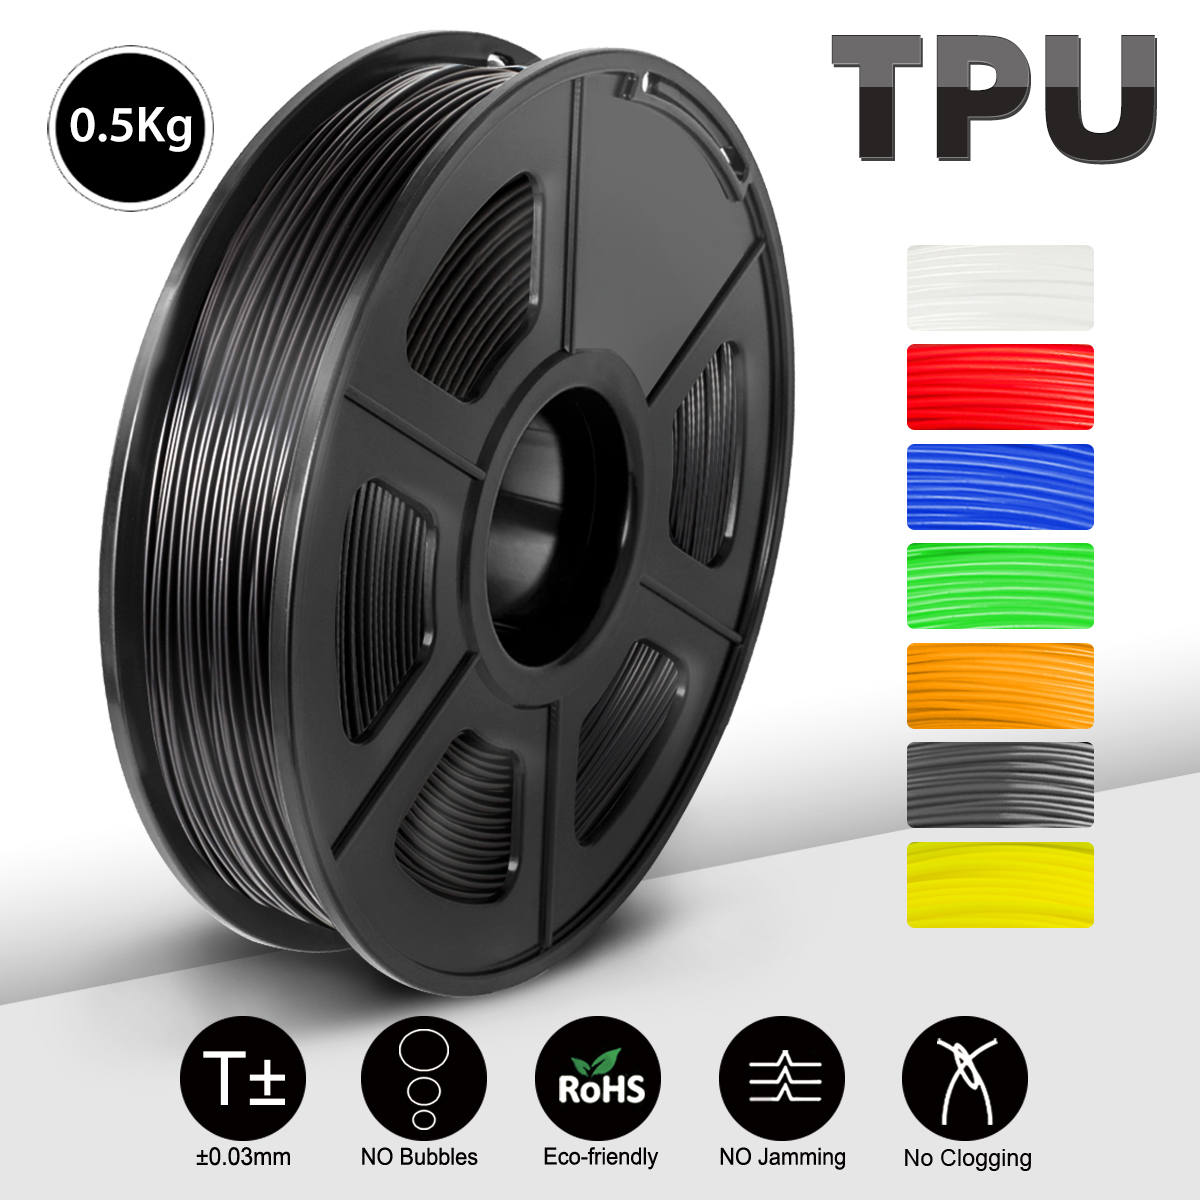 SUNLU 3D 인쇄 필라멘트 검정색 유연한 TPU 필라멘트 1.75mm 0.5kg(1.1LB) 치수 정확도 +/- 0.02 MM 쇼어 95A